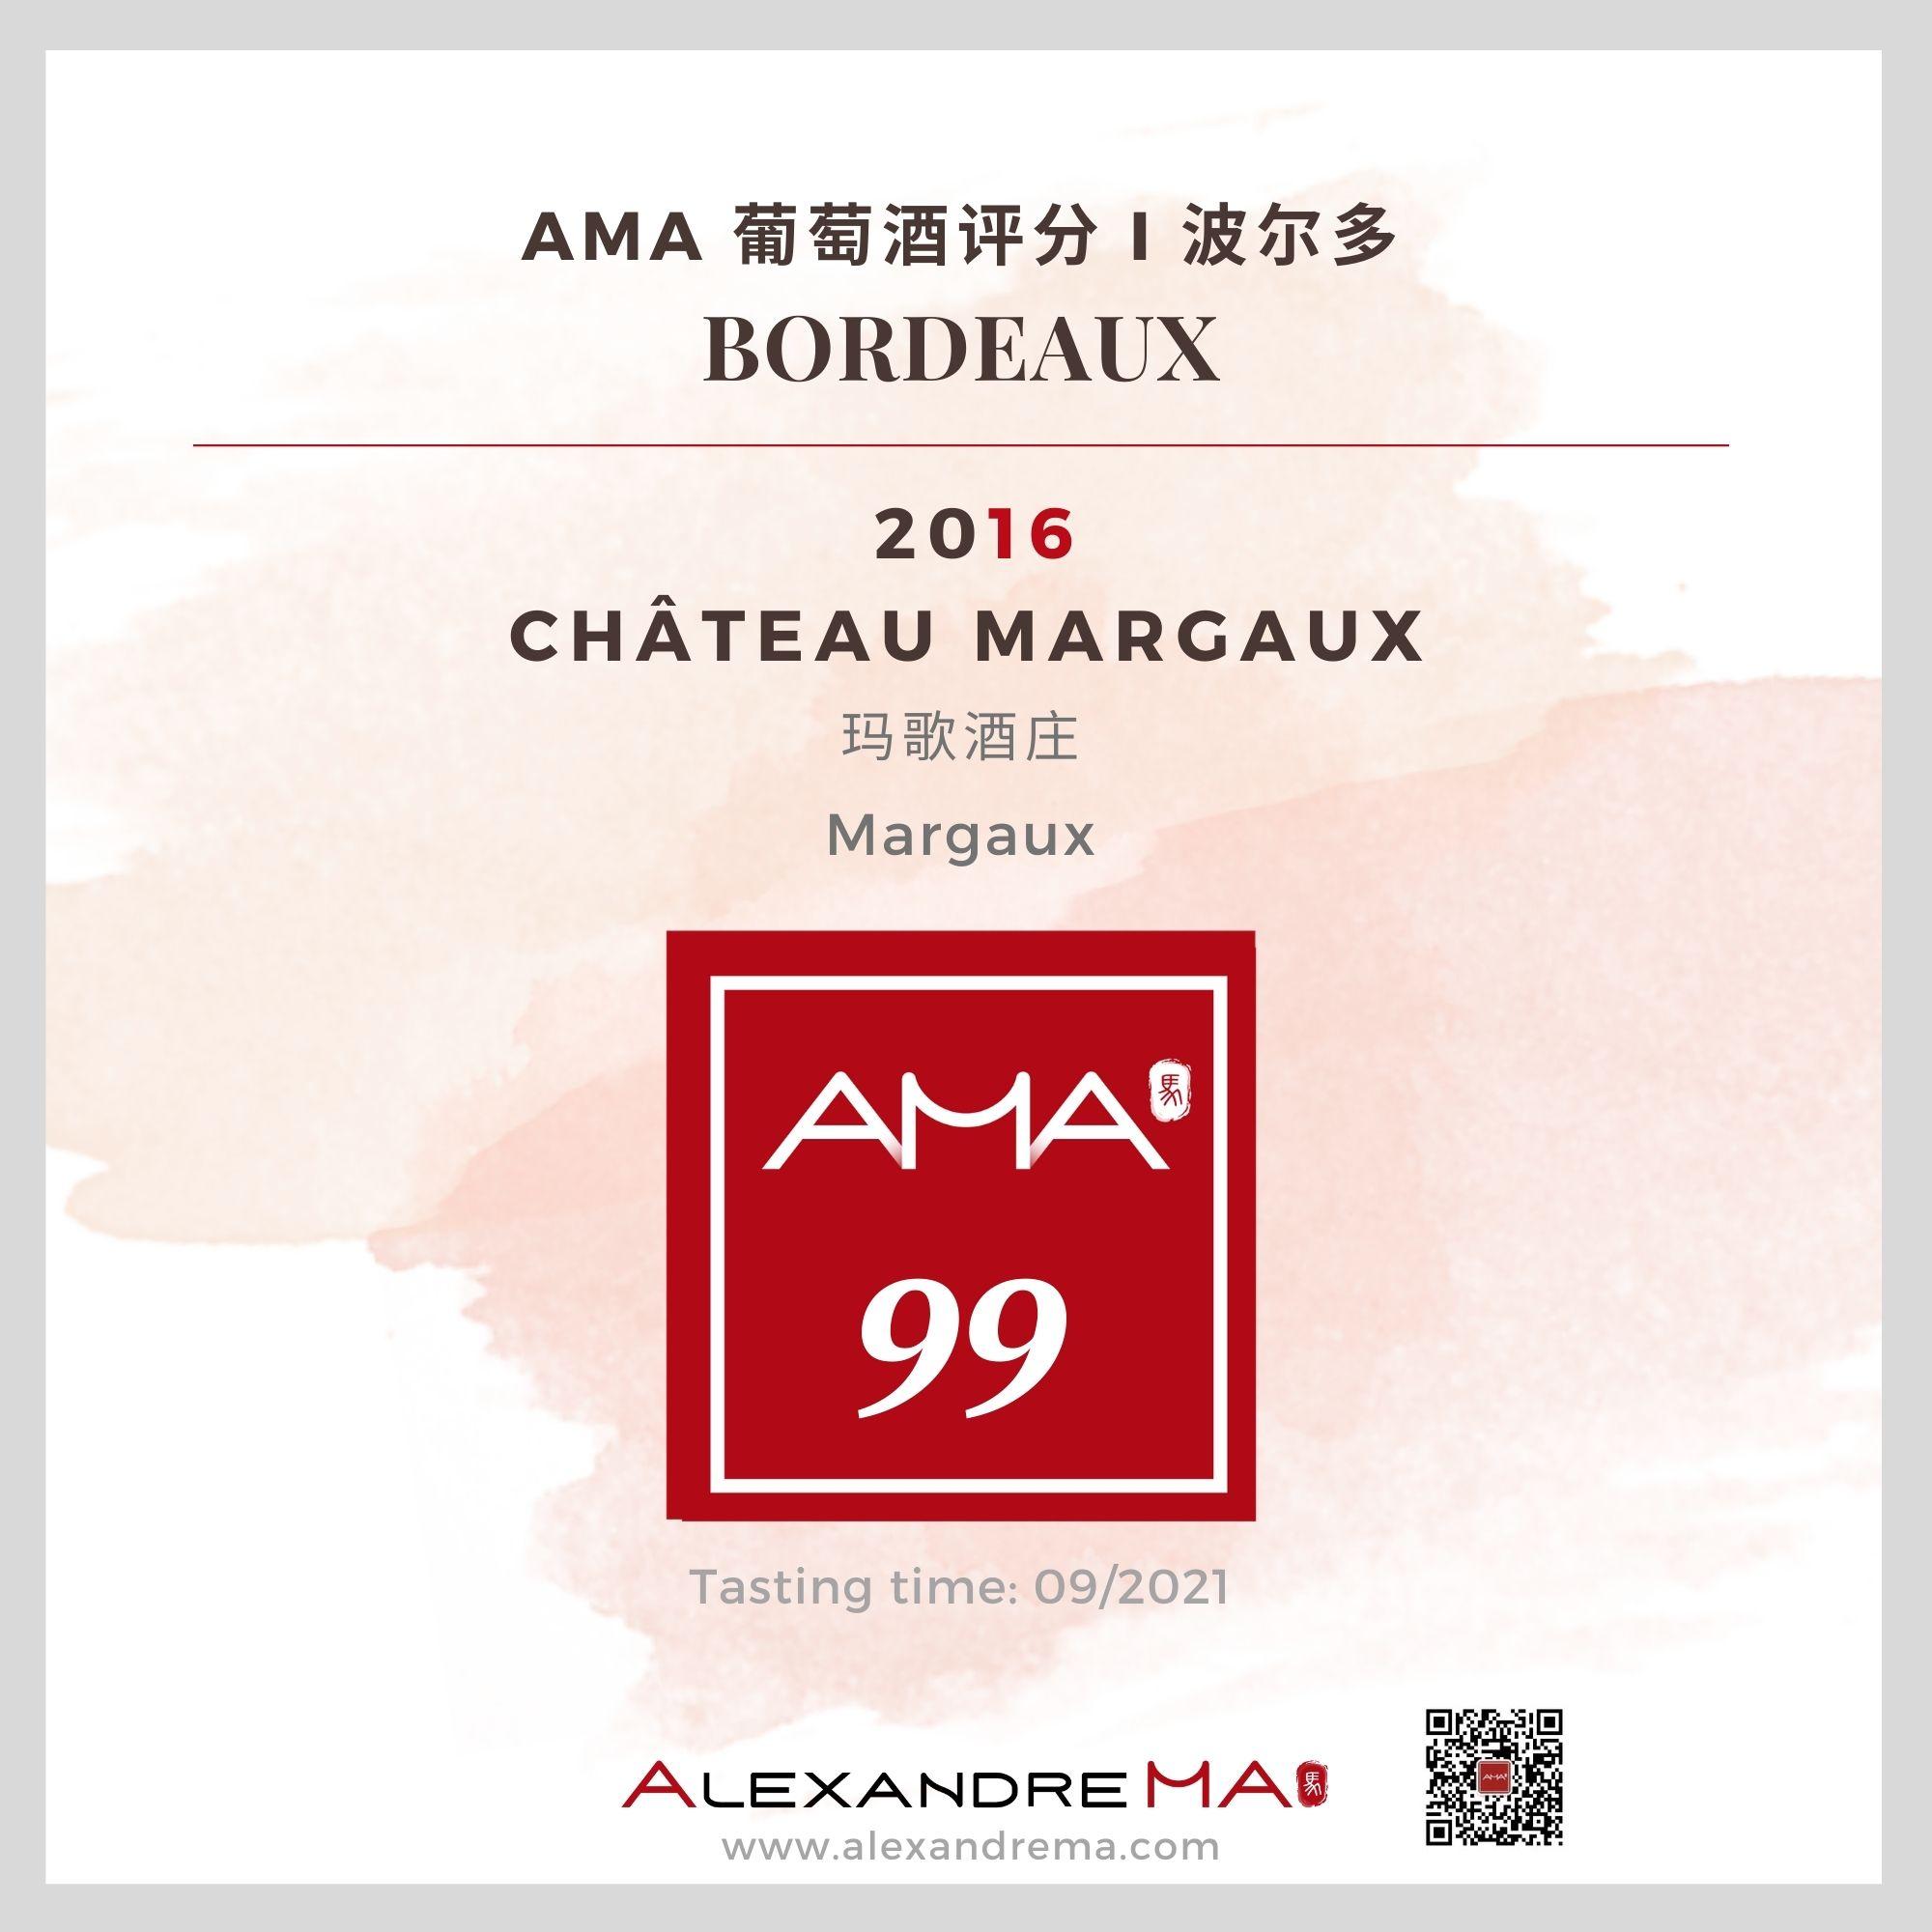 Château Margaux 2016 - Alexandre MA